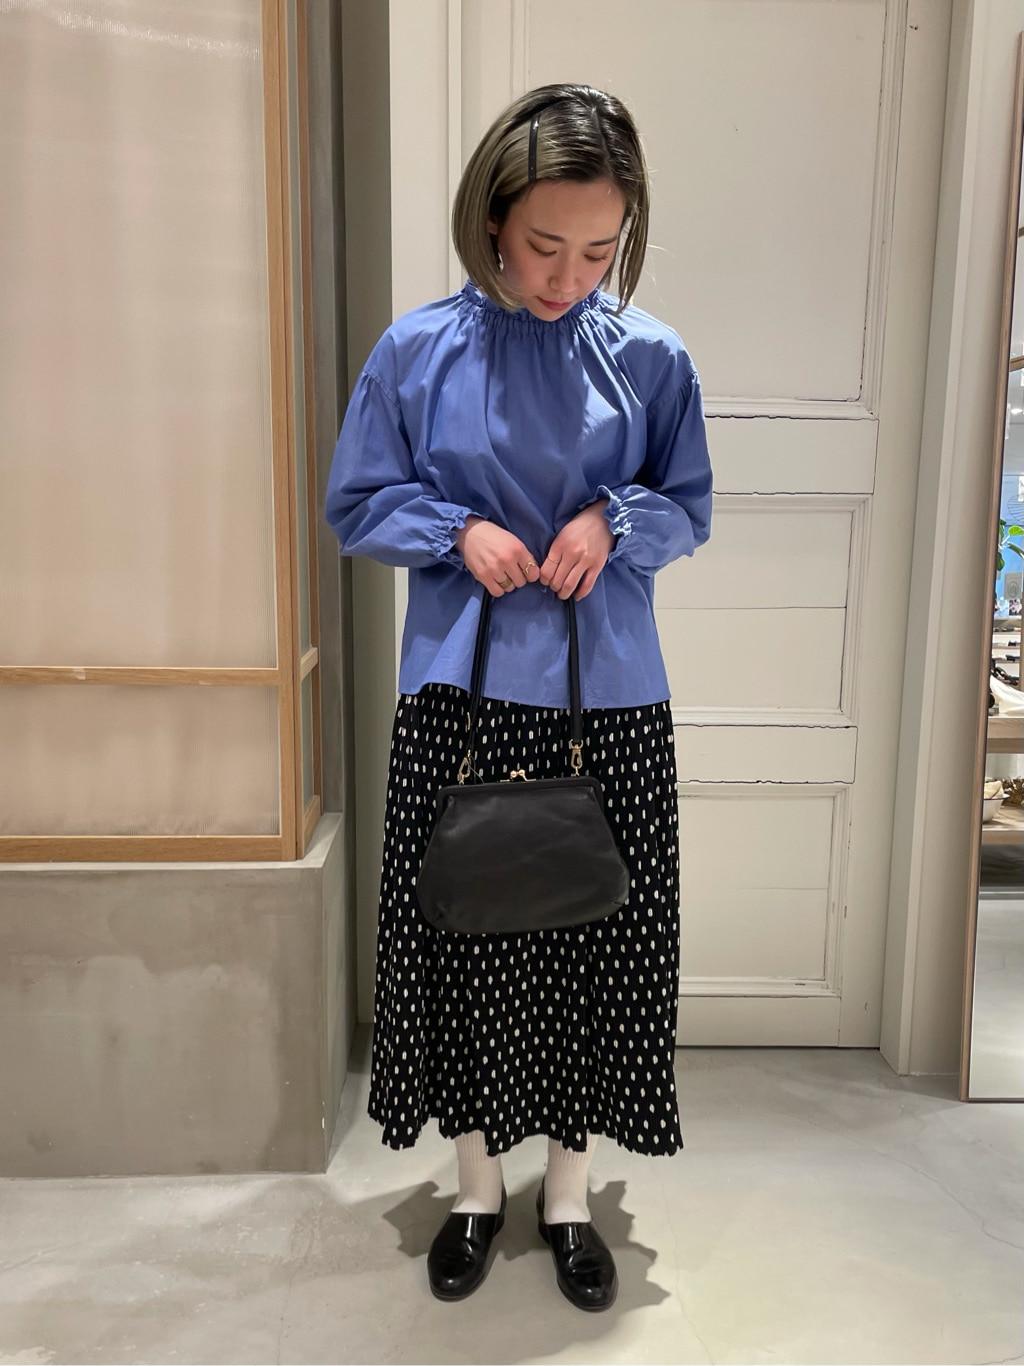 bulle de savon 渋谷スクランブルスクエア 身長:154cm 2021.05.06